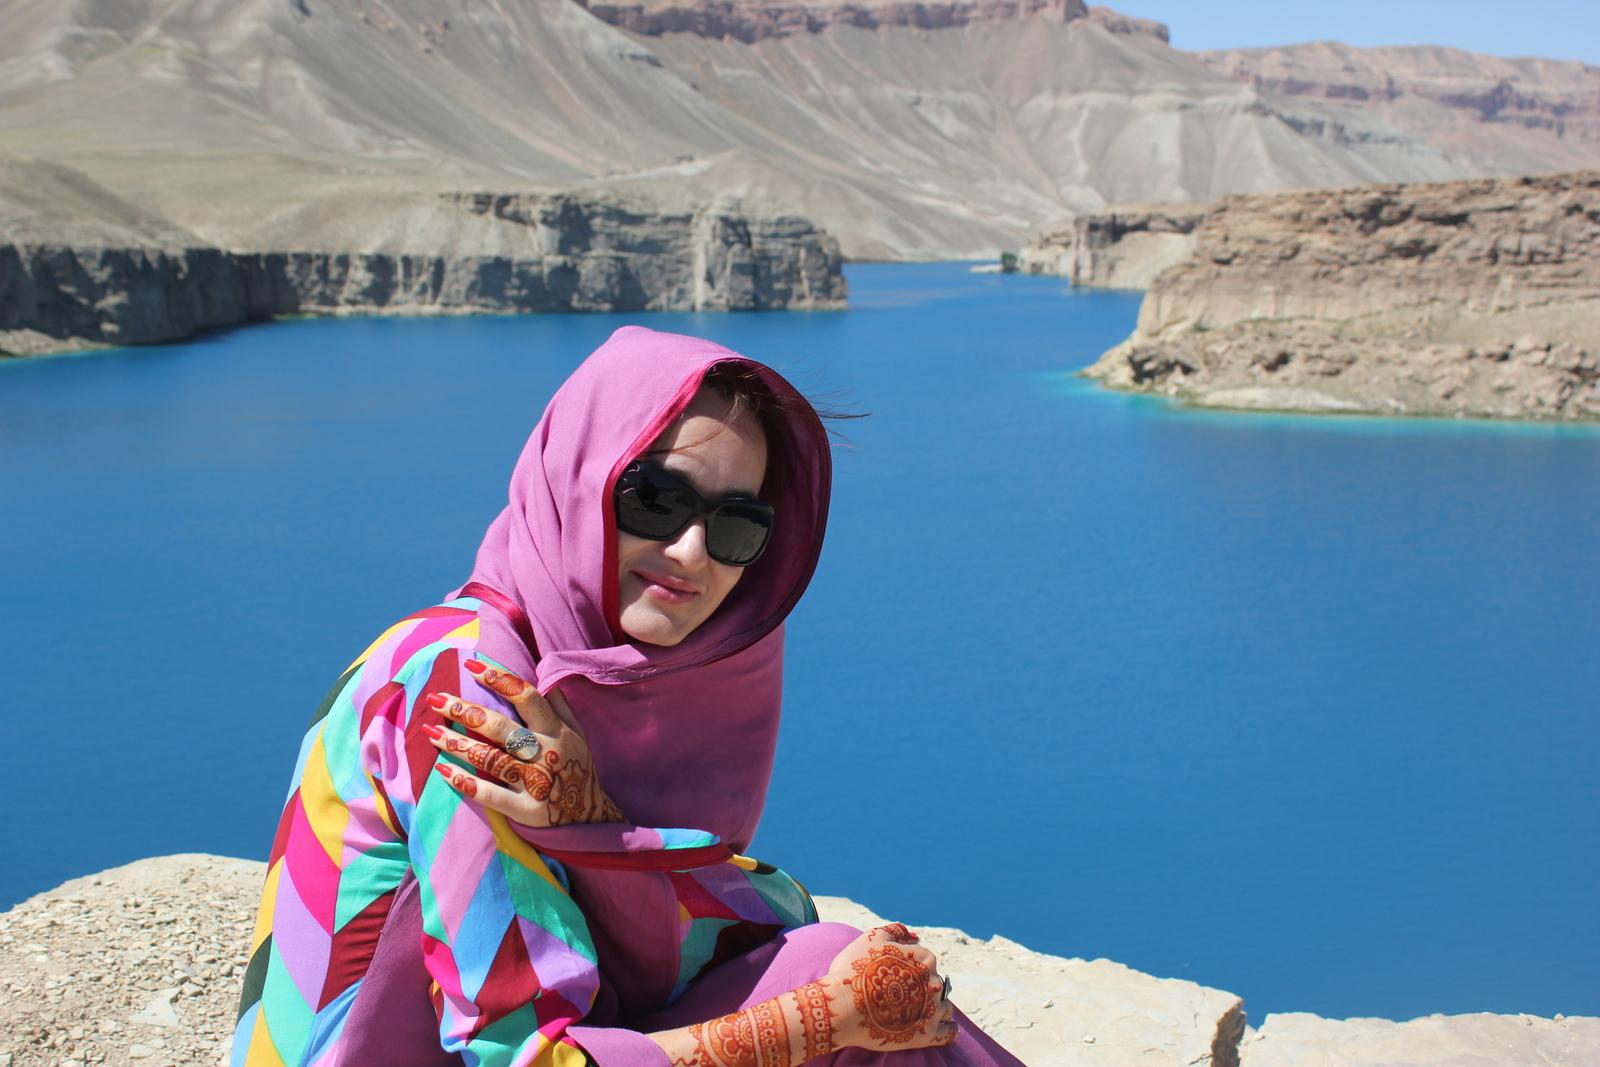 Renata Matusiak w Pakistanie, nad jeziorem Band-e-Amir [fot. archiwum R. Matusiak]